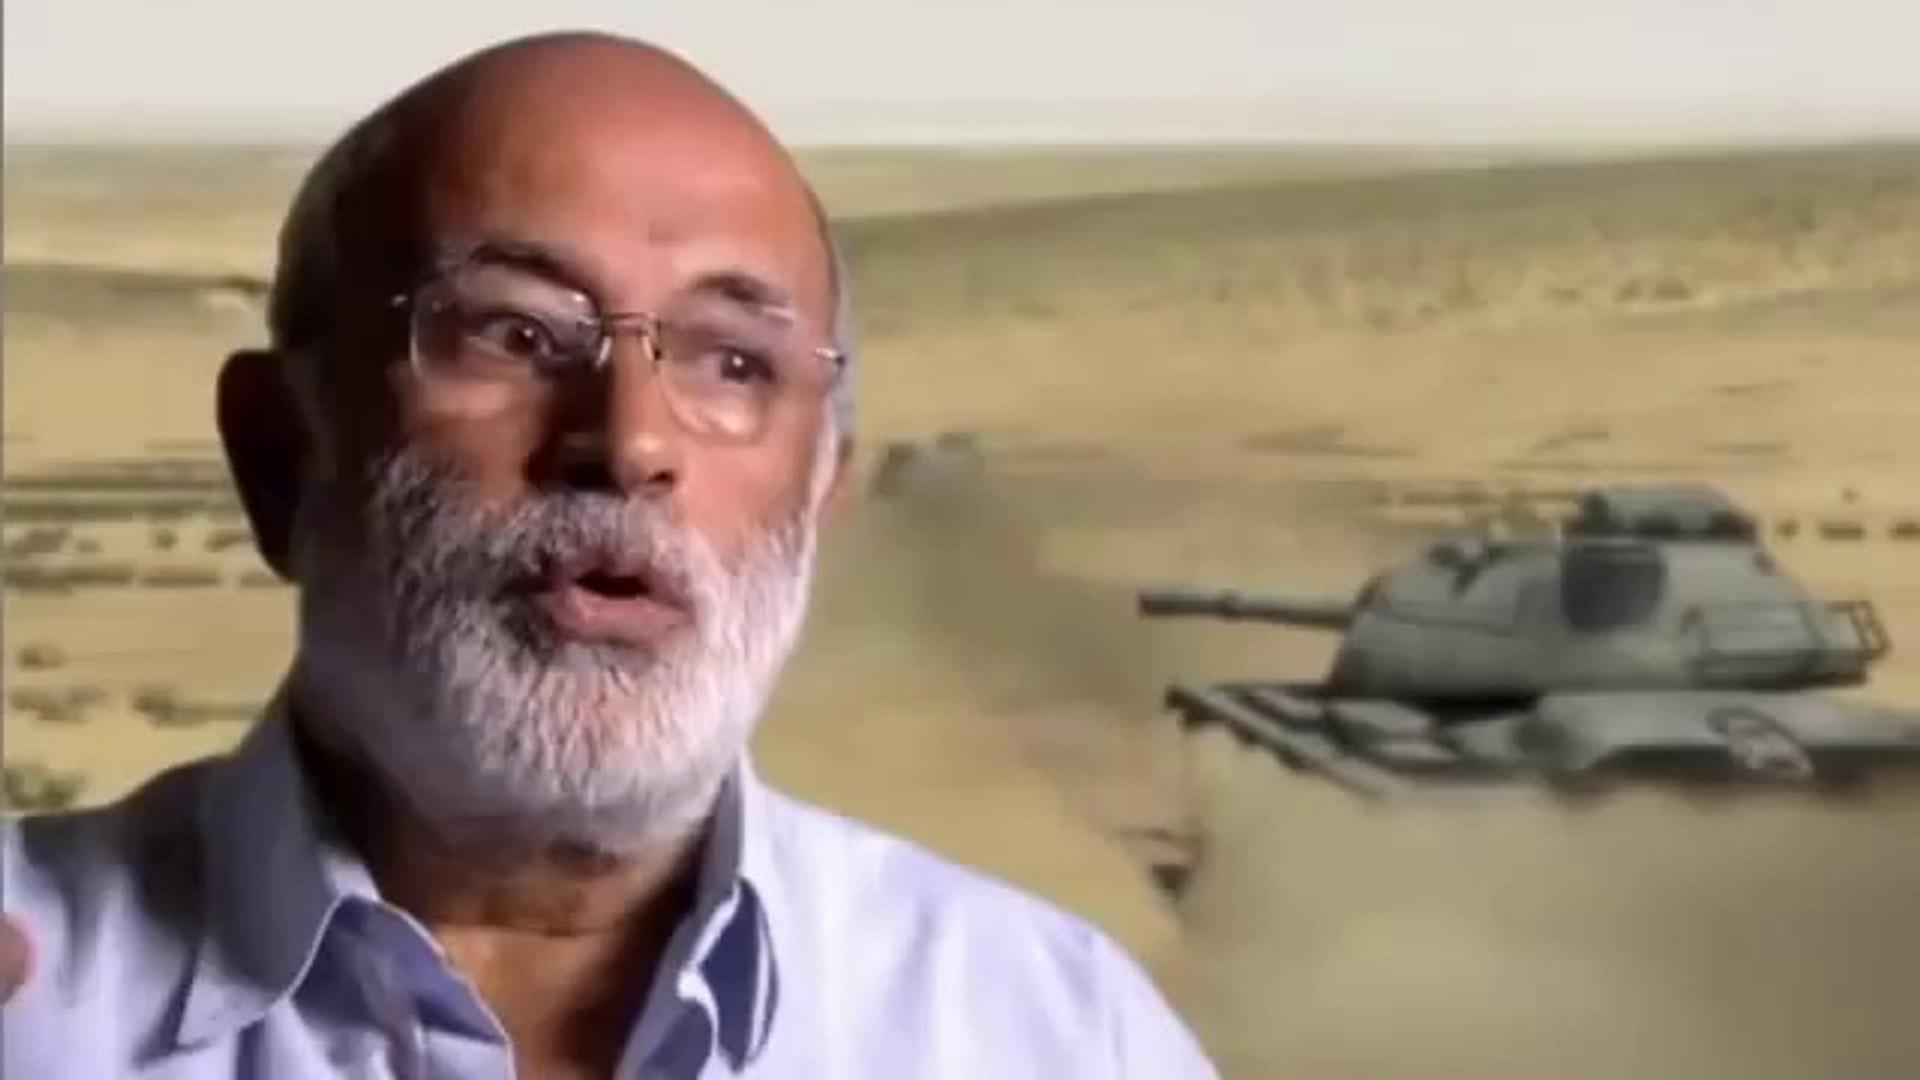 GREATEST TANK BATTLES - THE SIX DAY WAR - THE ARAB ISRAELI WAR 1967 - Military History (documentary)